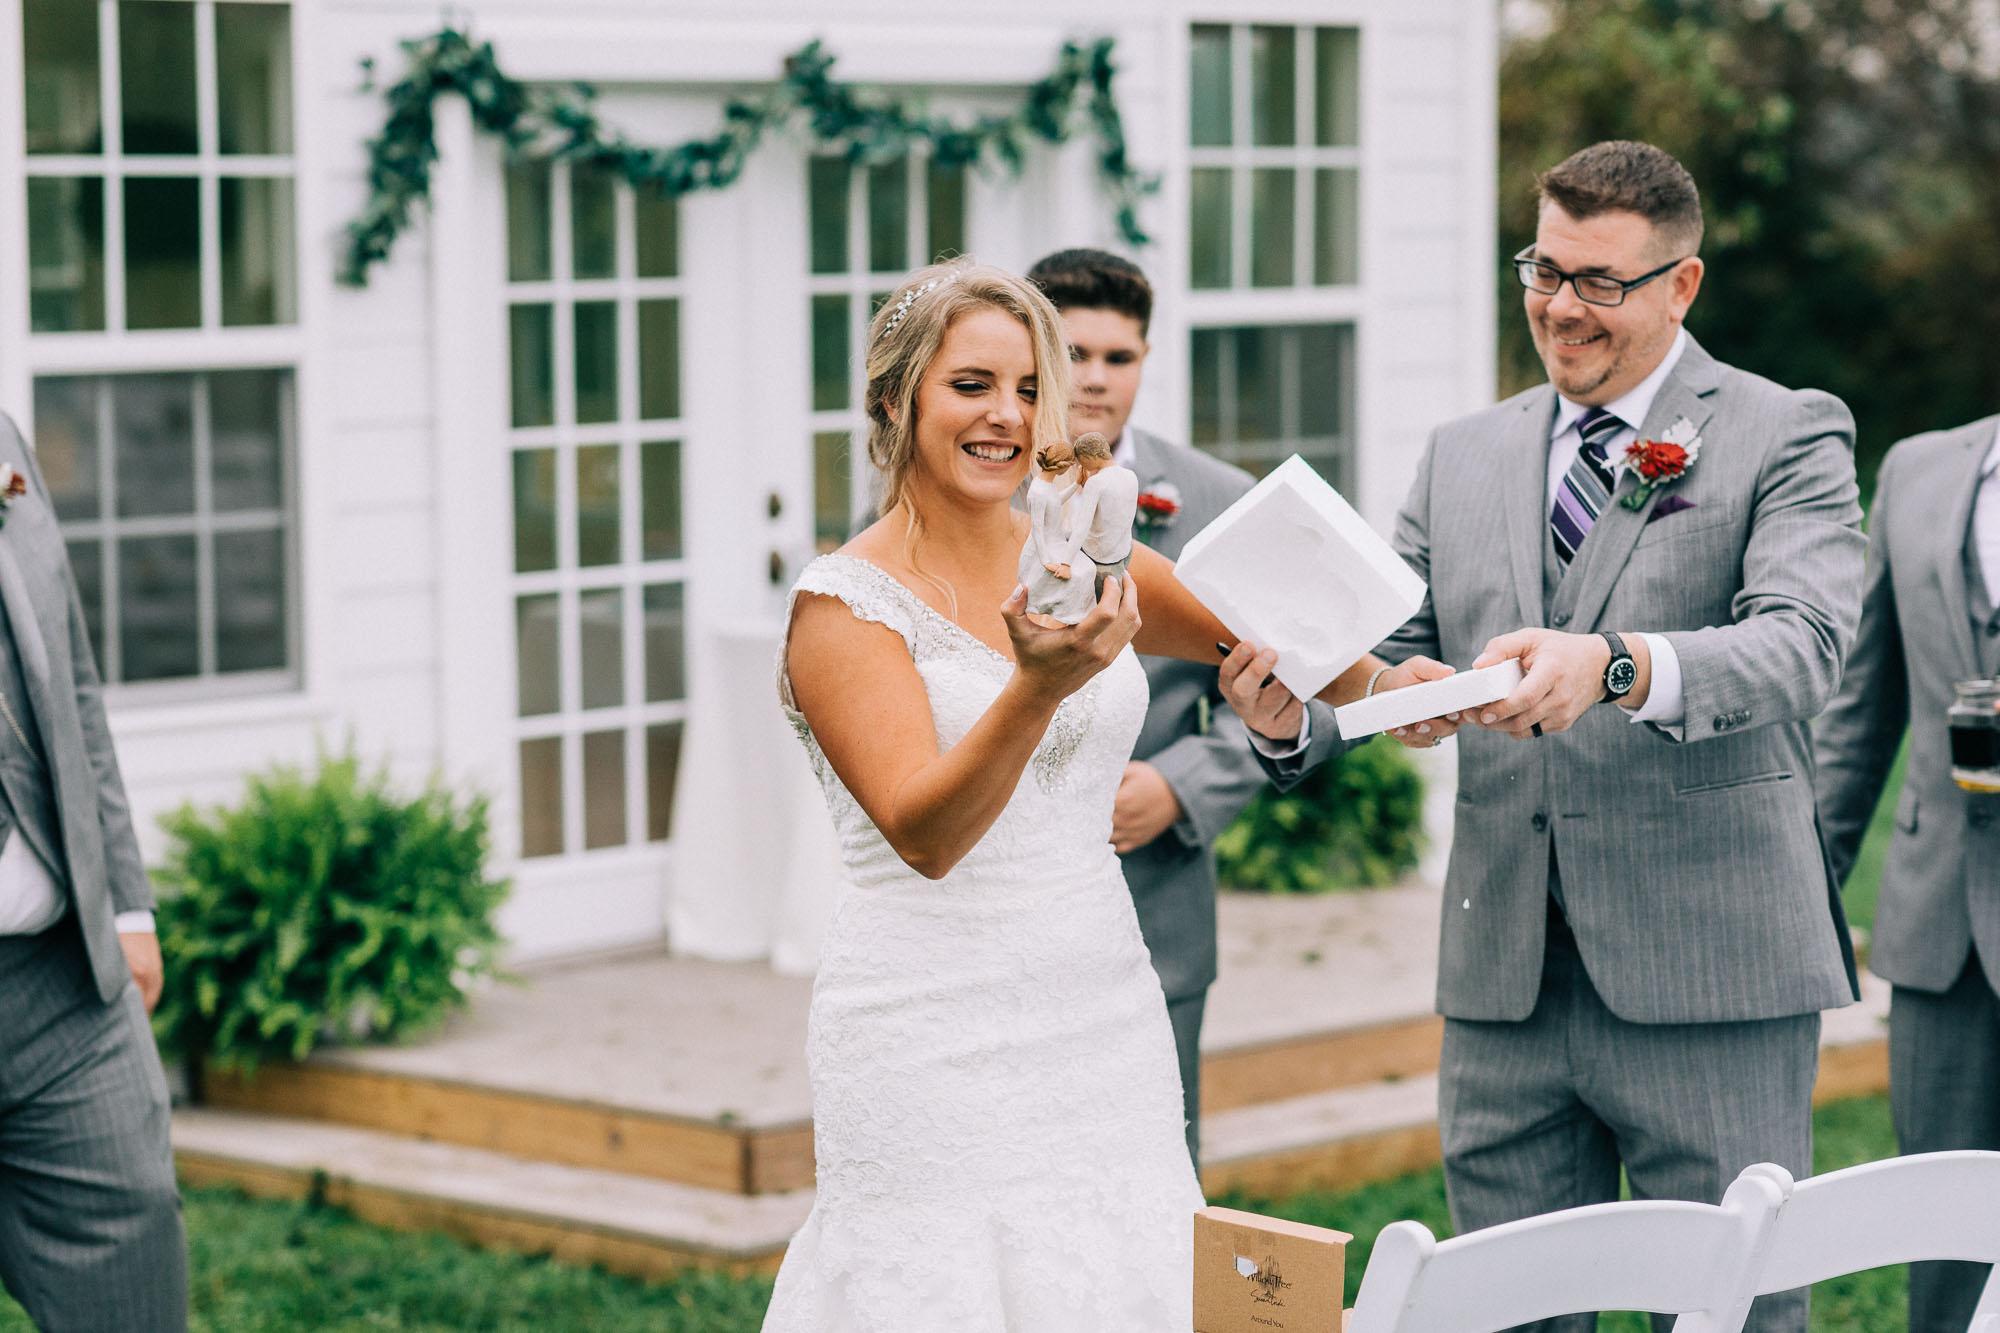 Lodge-at-Raven-Creek-October-wedding-42.jpg